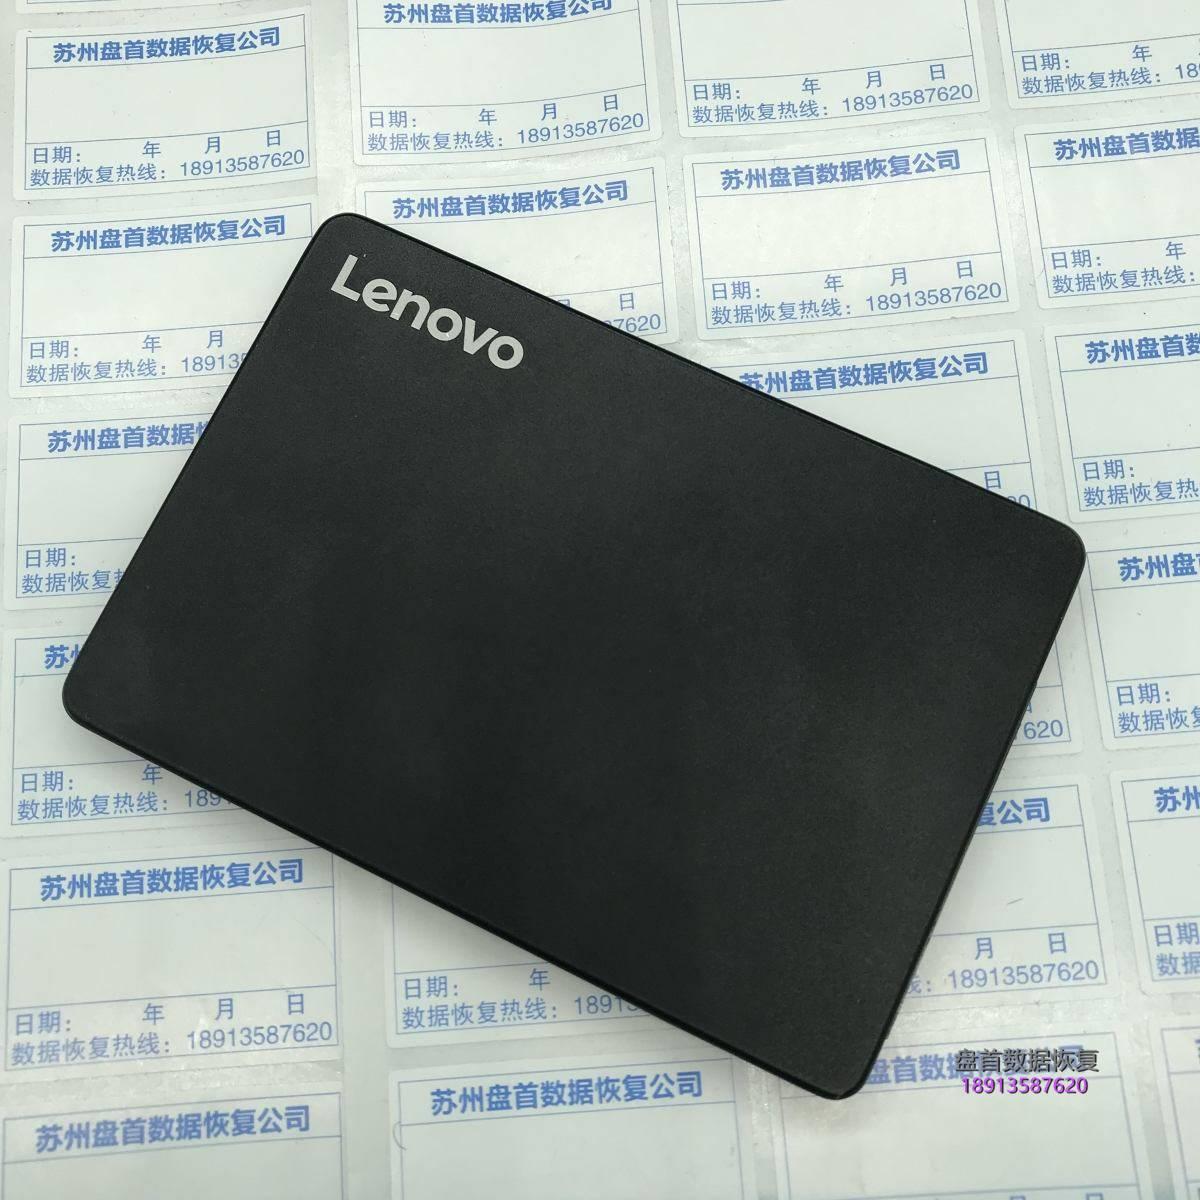 lenovo联想SL700固态硬盘掉盘通病SSD数据恢复成功